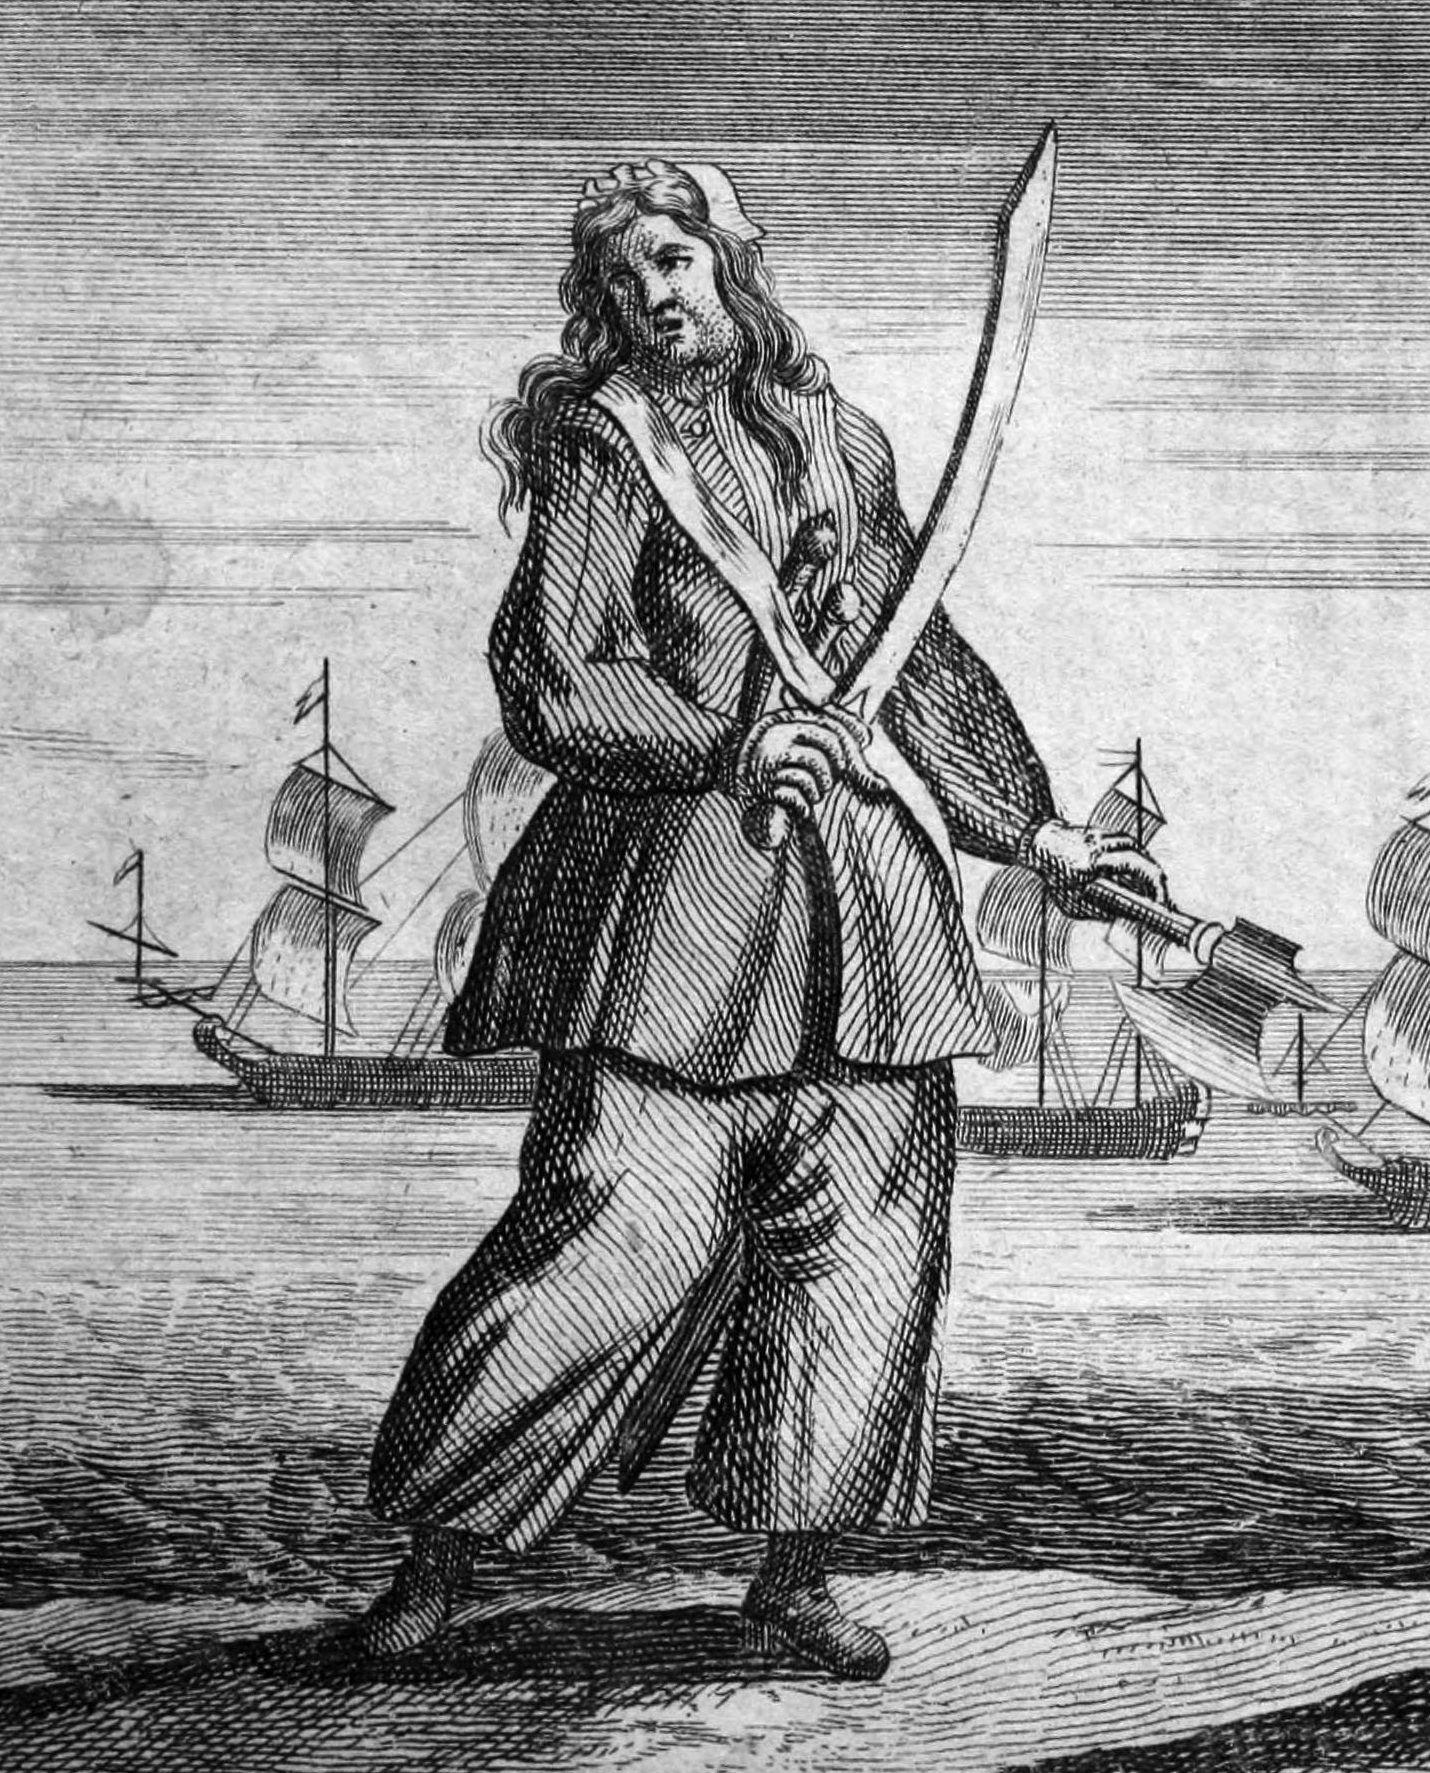 Pirate Ann Bonny Turks and Caicos